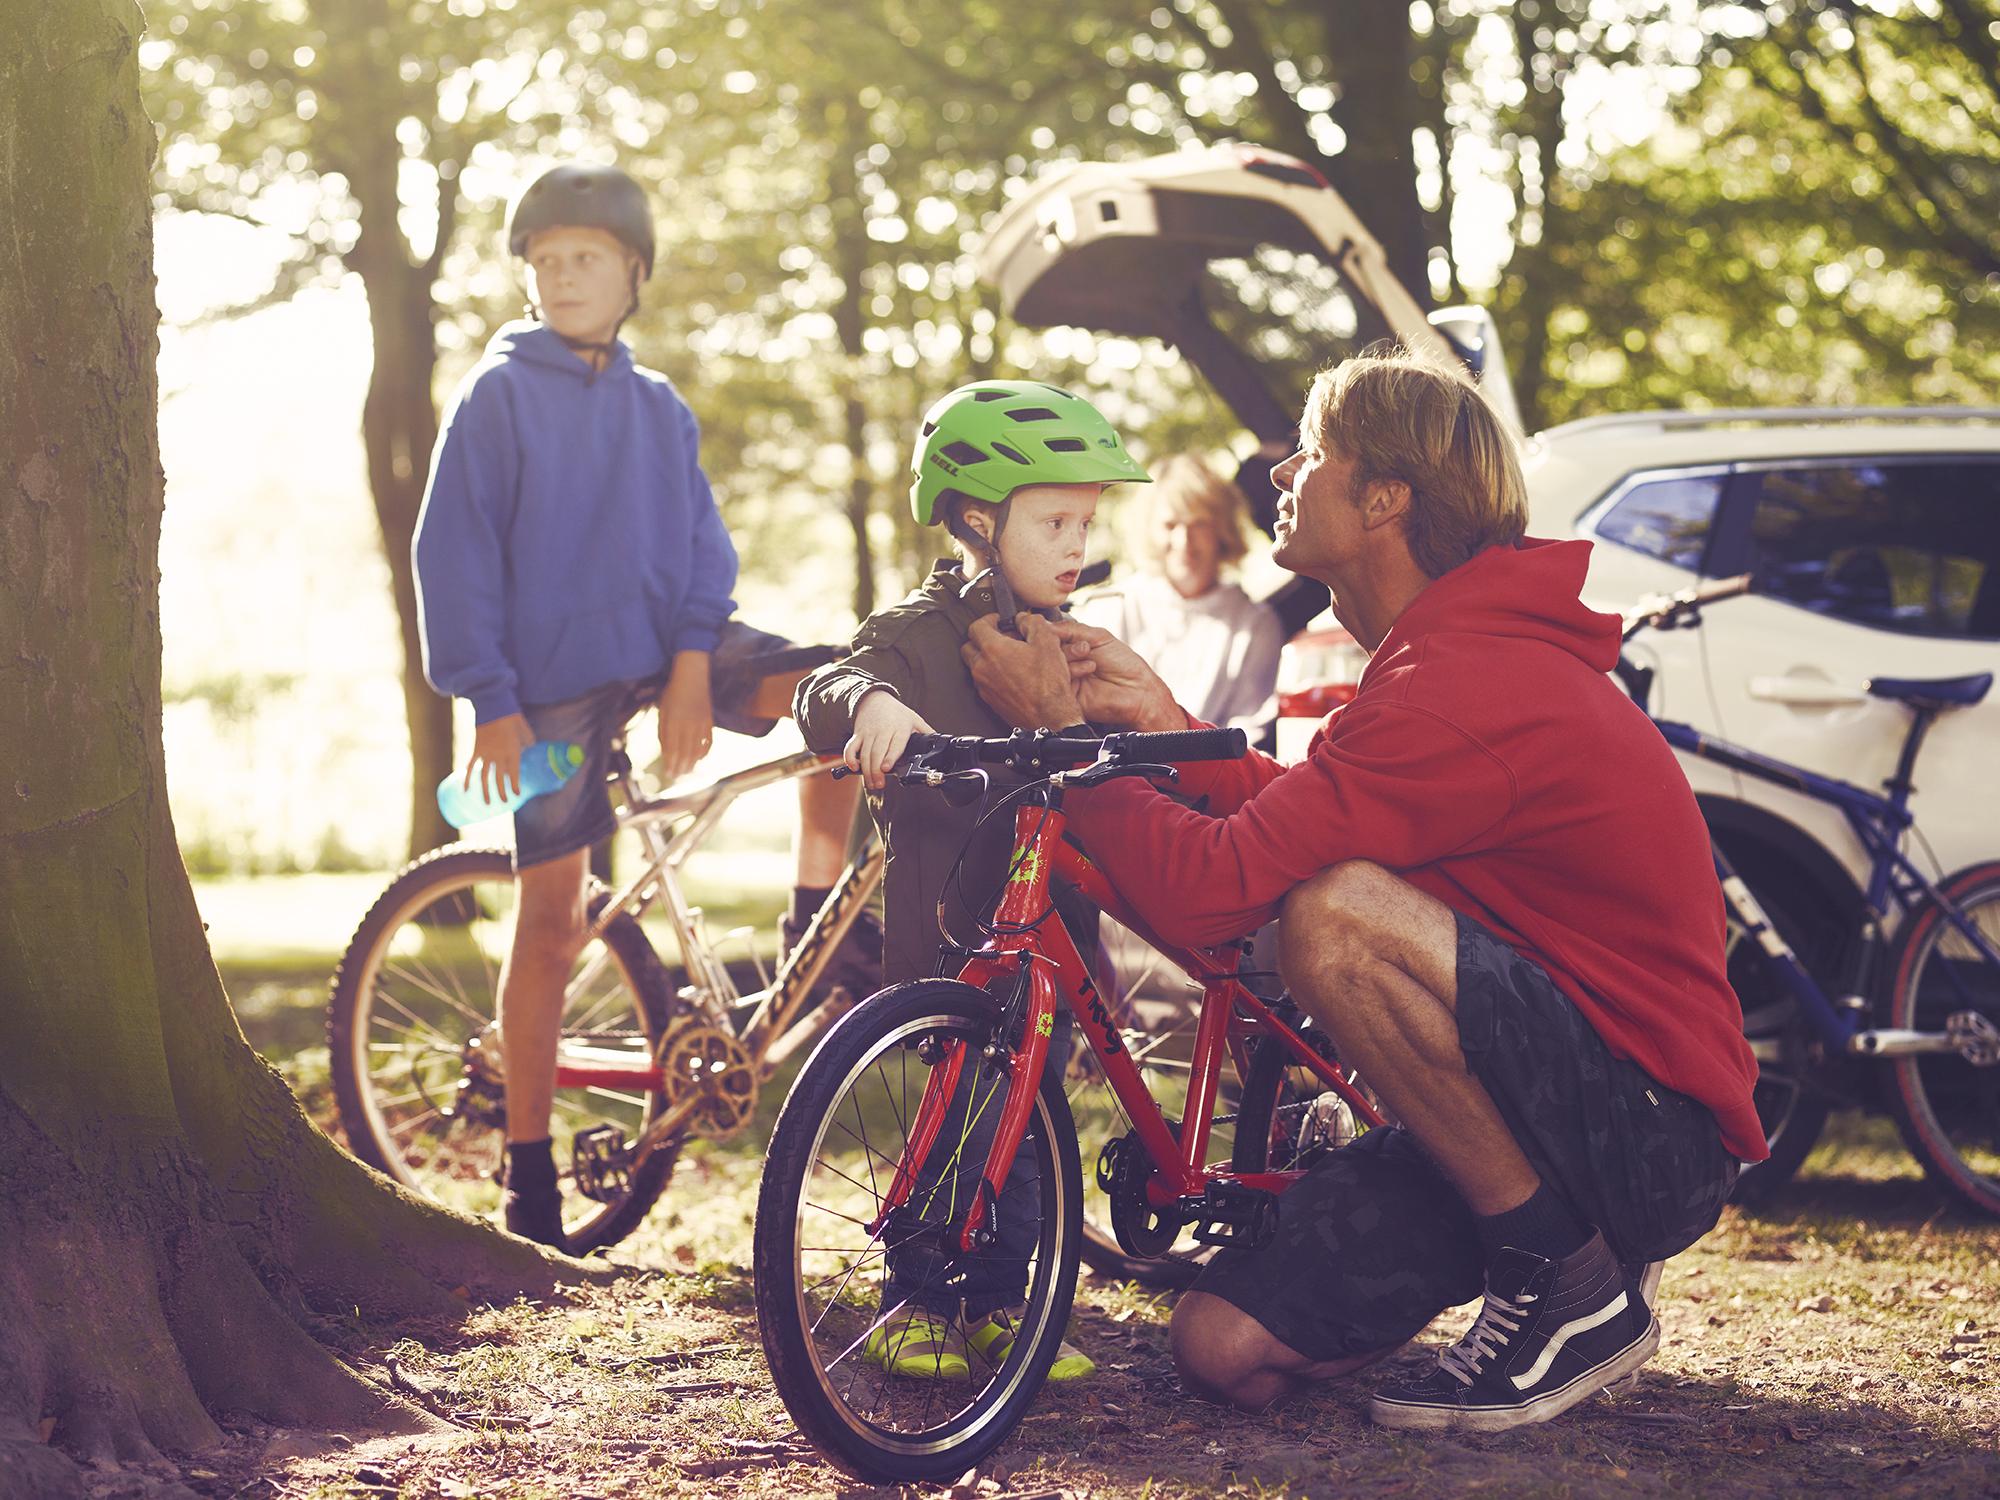 Laurie_Griffiths_Motability_Cyclists.jpg